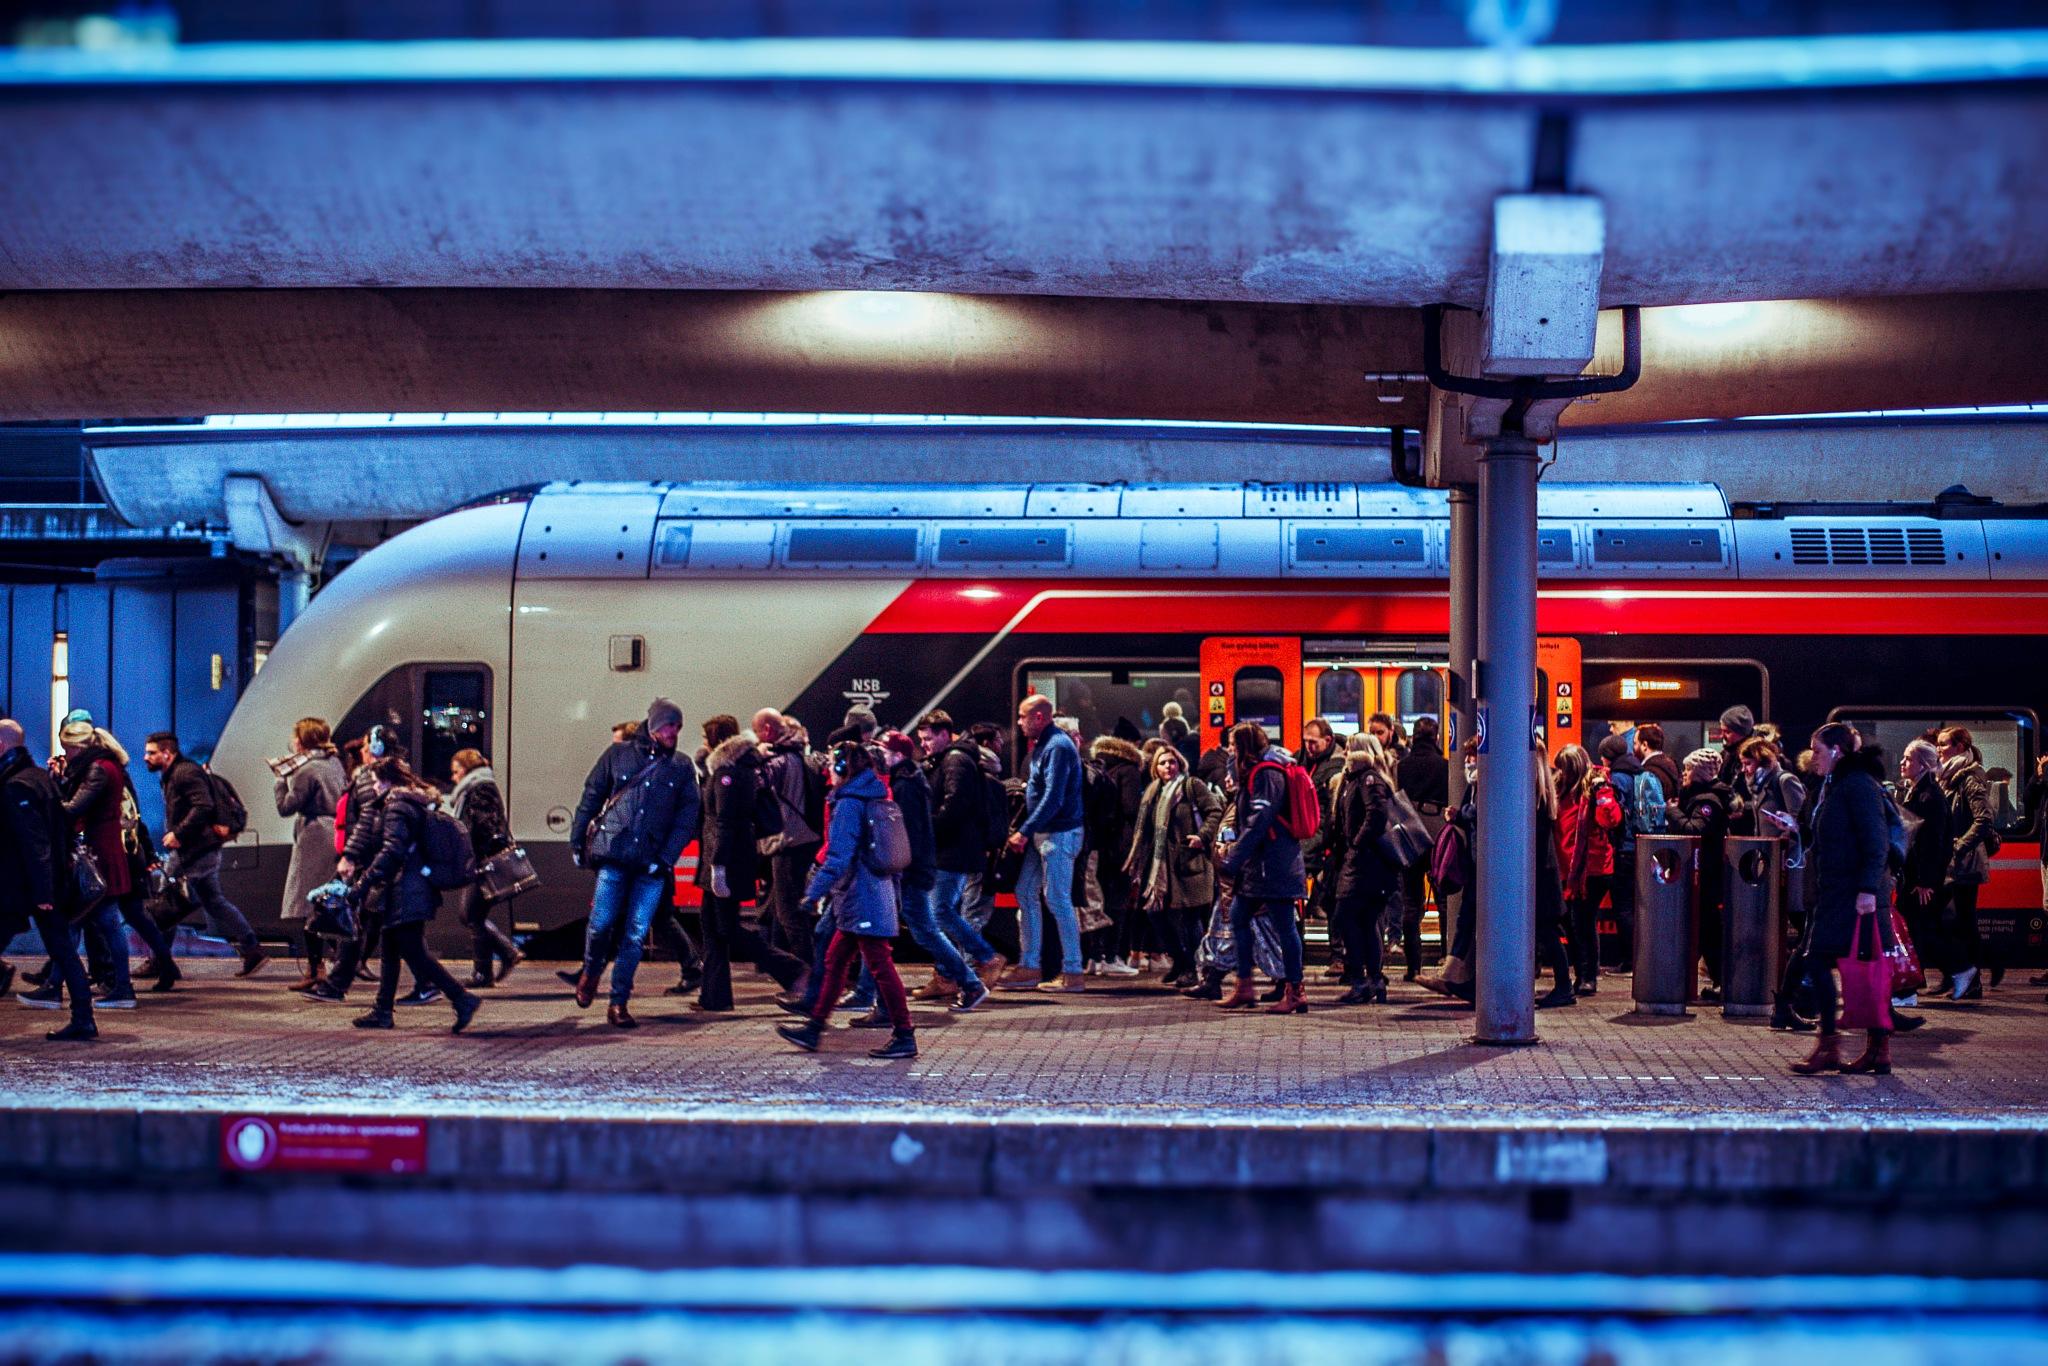 Winter Commuters by Goran Jorganovich